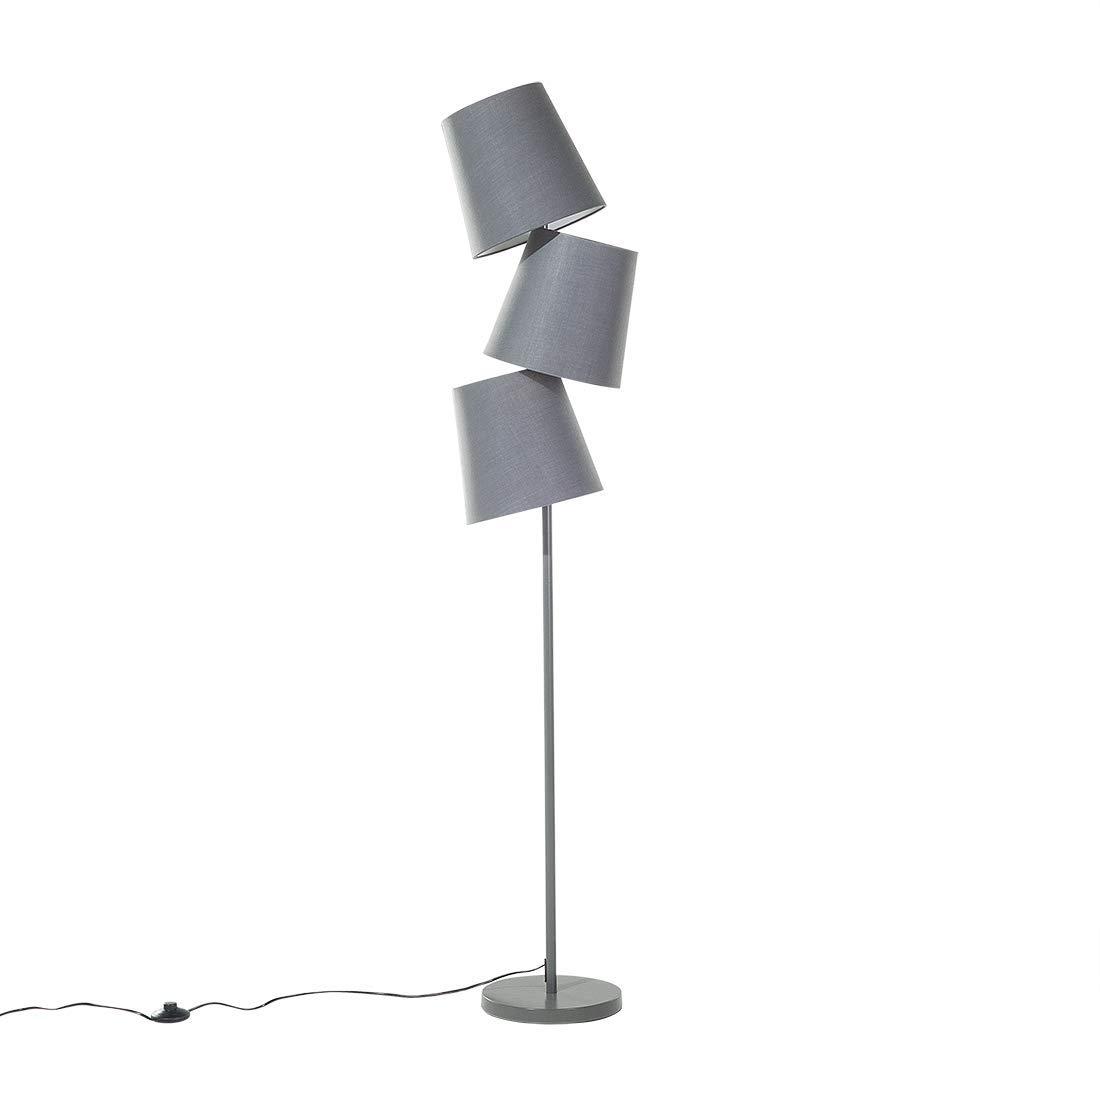 Beliani Moderne Stehlampe 3 Lampenschirme Polyester Metall Grau